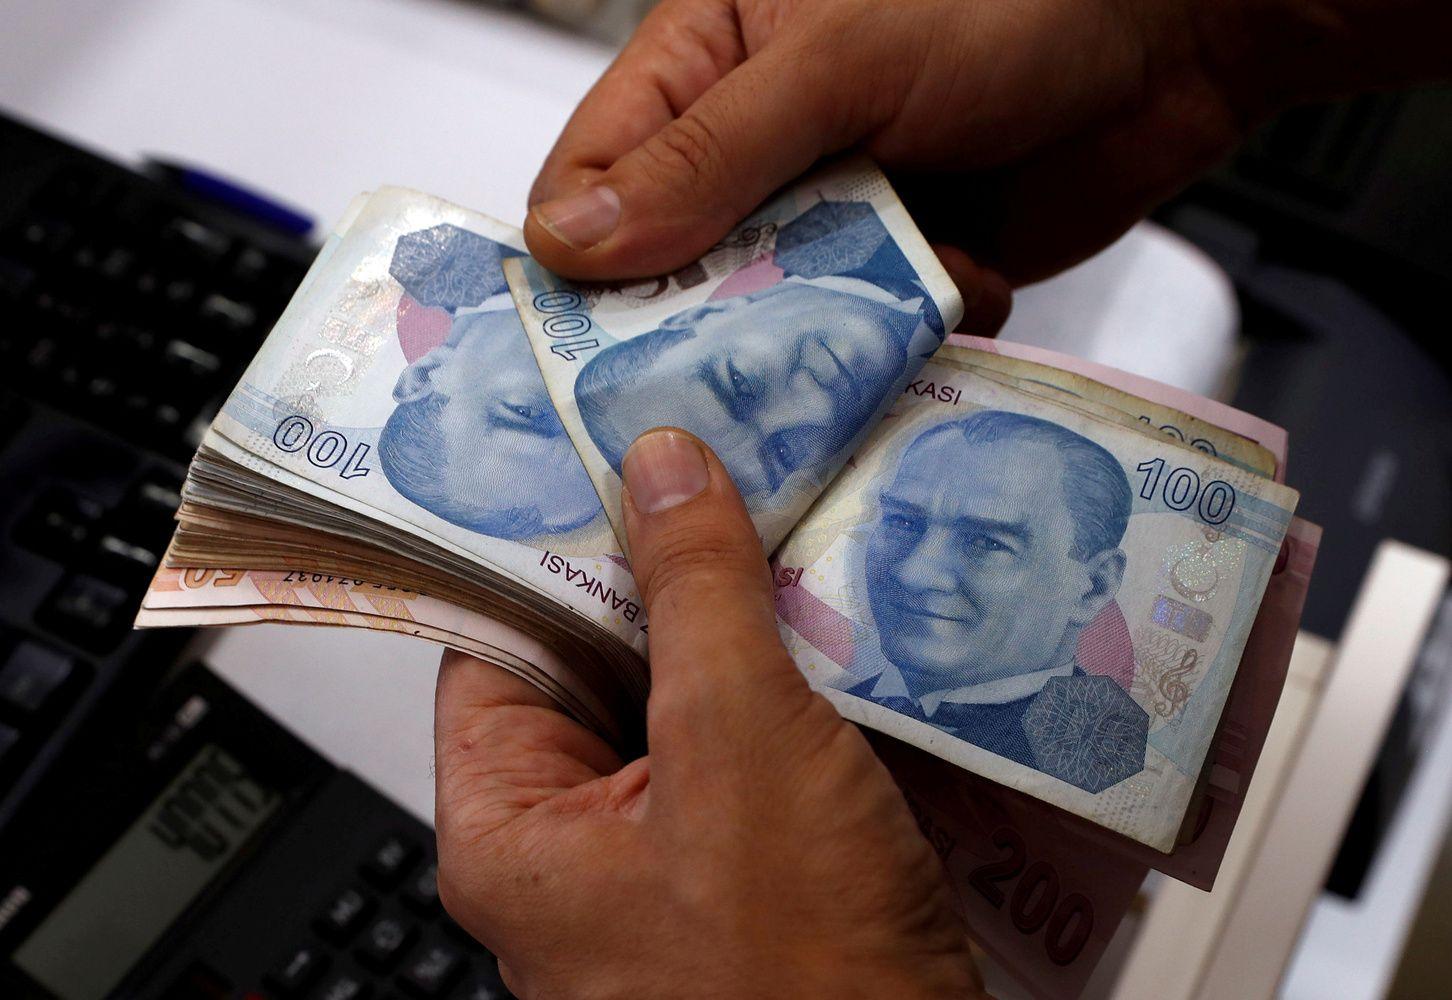 Stocks, Euro Fall on Turkey Worries; Yen Gains: Markets Wrap